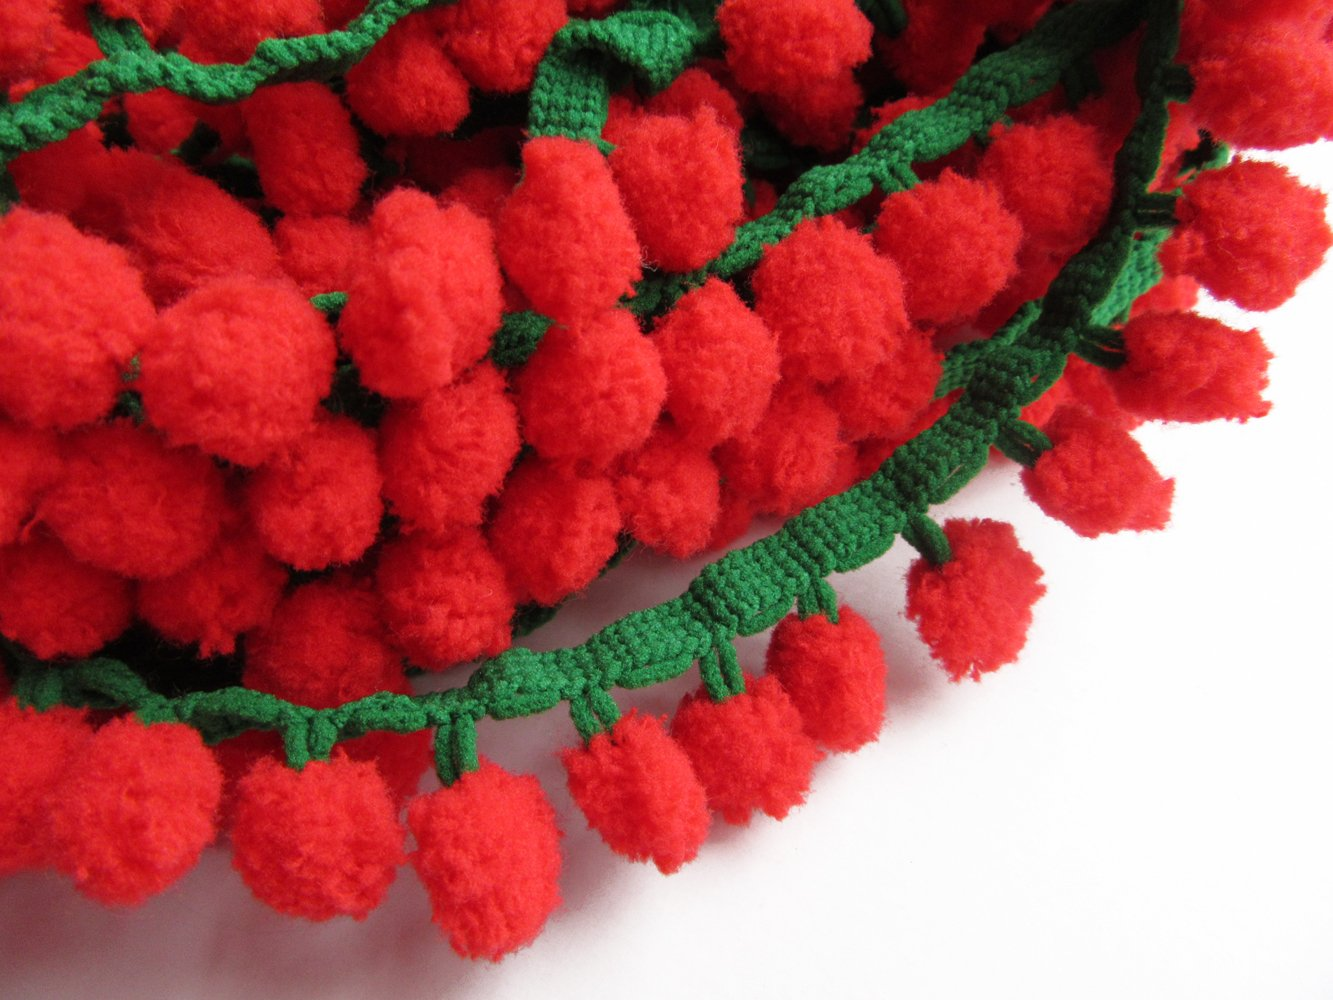 YYCRAFT Red//Green Pom Pom Ball fringe Trim Ribbon Sewing Xmas 5 Yards